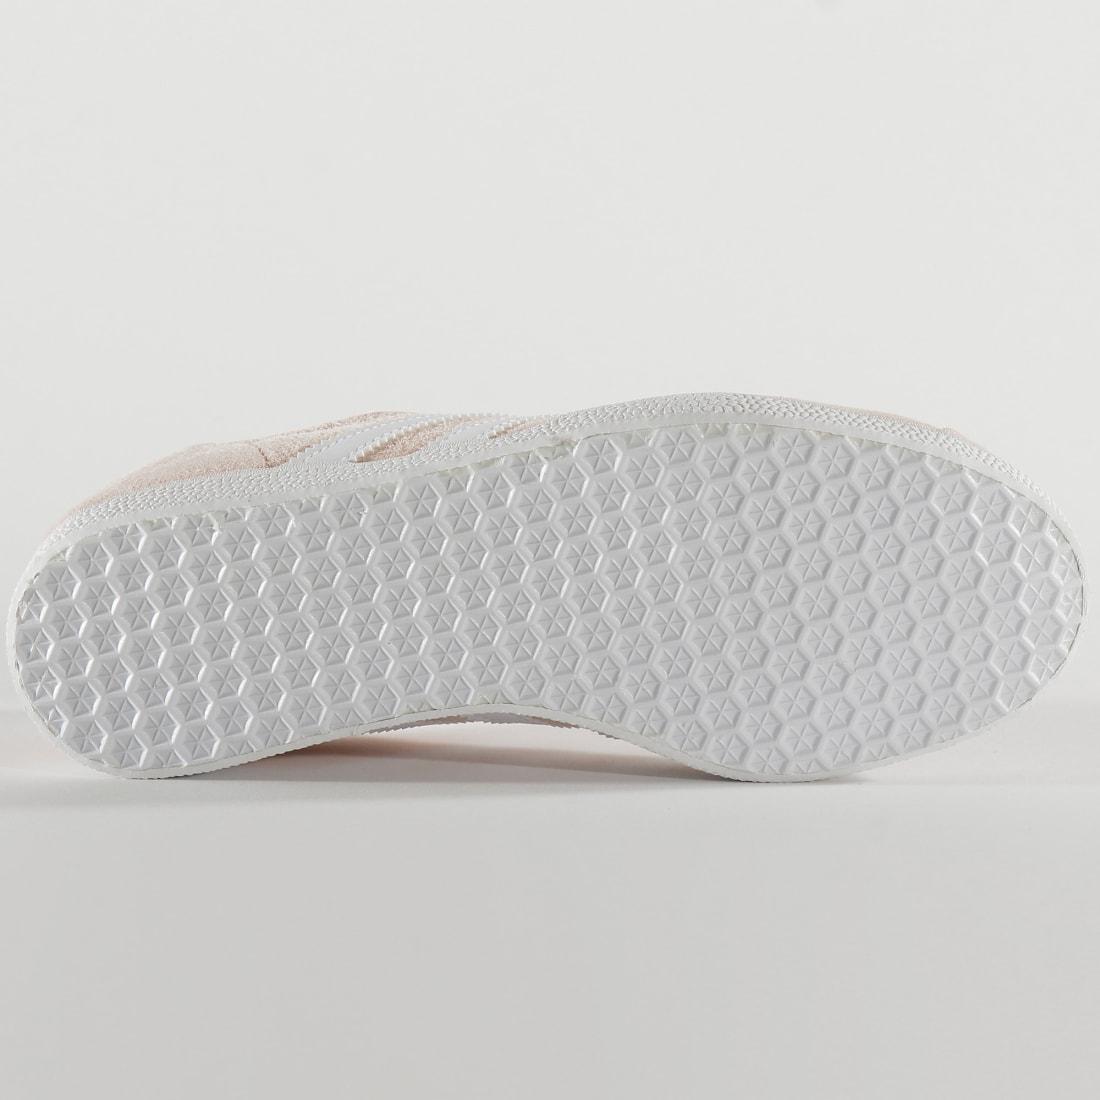 adidas Baskets Femme Gazelle BB5472 Vapor Pink White Gold